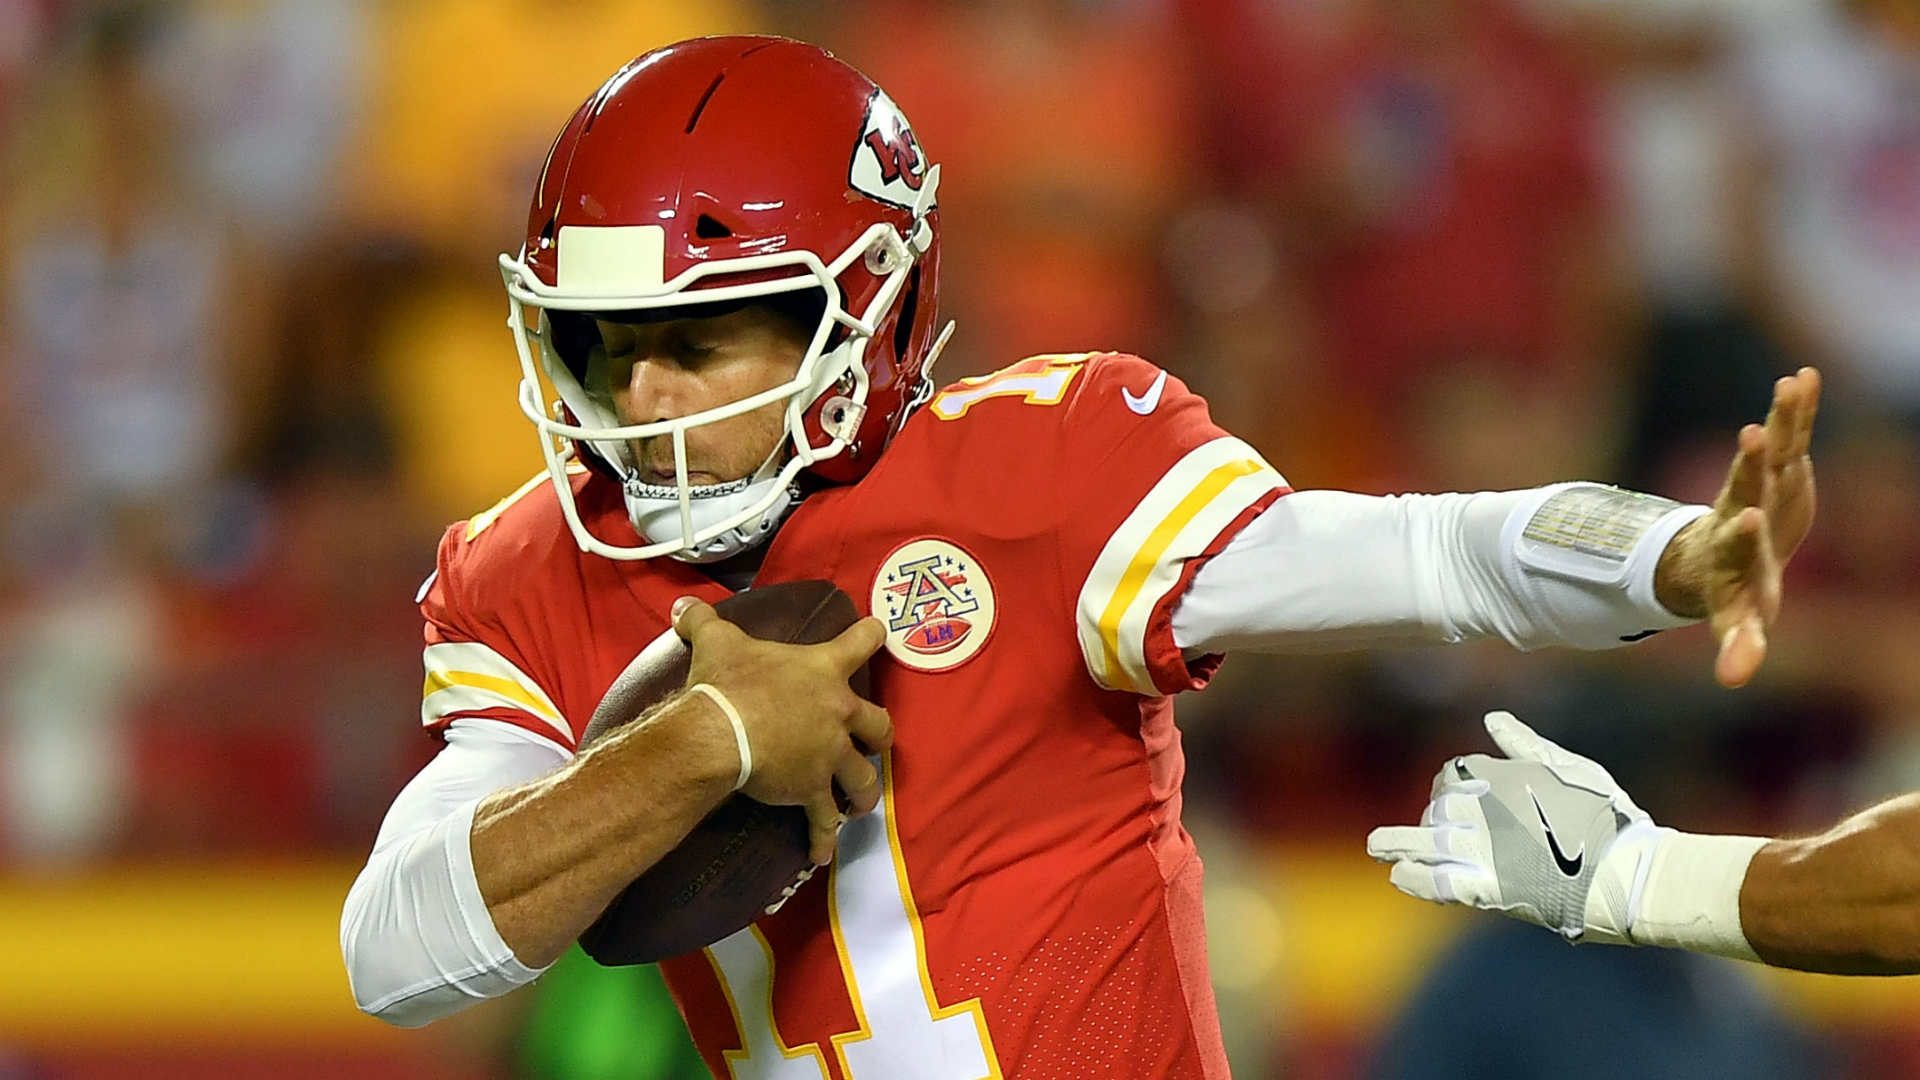 Monday Night Match Up: Redskins at Chiefs